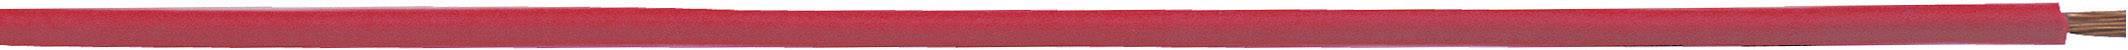 Opletenie / lanko LappKabel 4510052 H05V-K, 1 x 0.75 mm², vonkajší Ø 2.40 mm, 100 m, biela